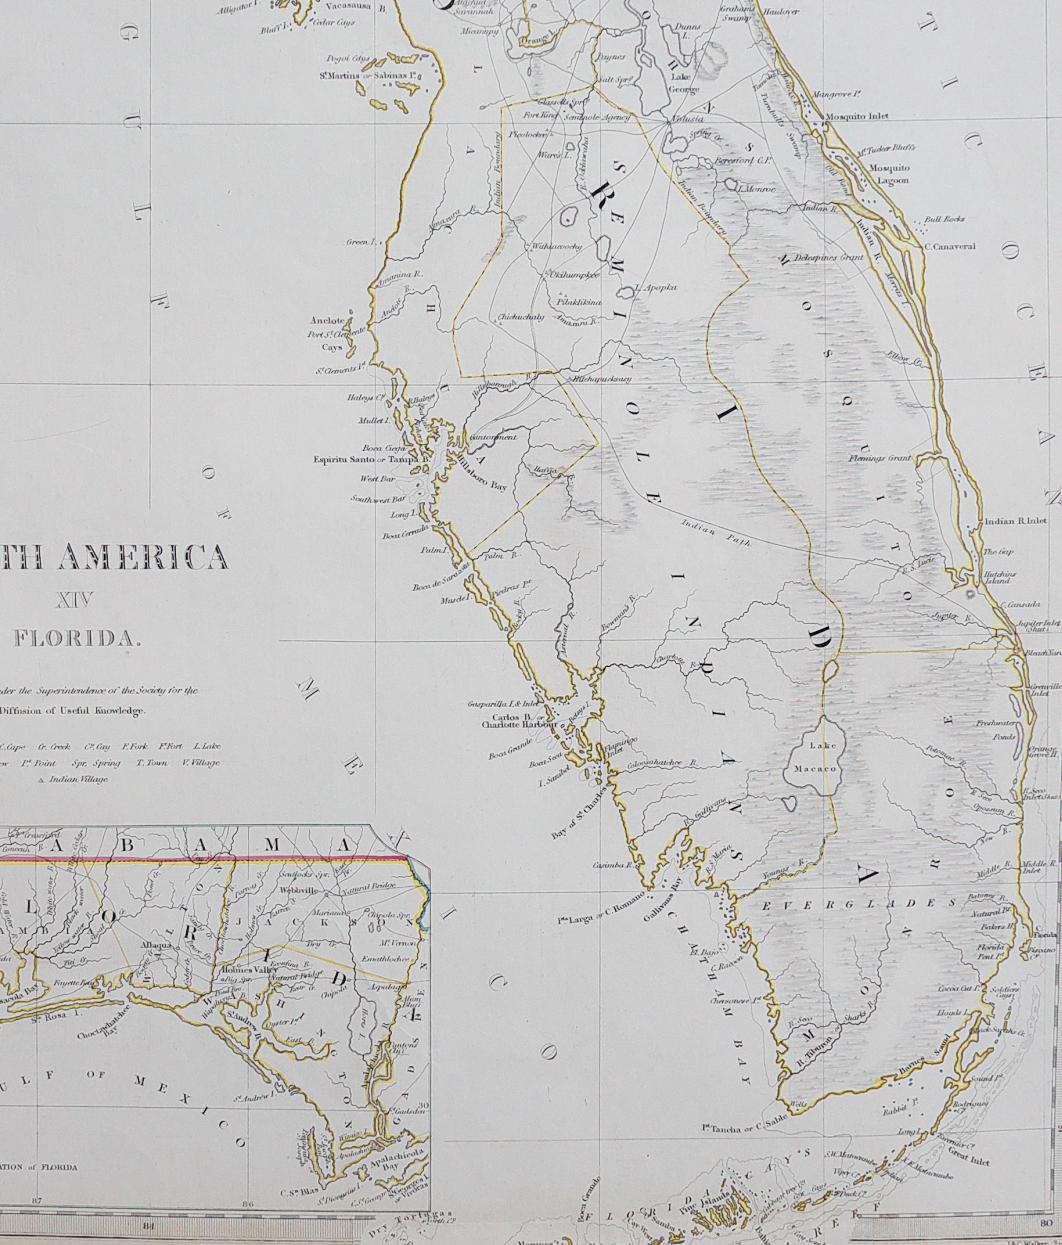 Sduk Map Of Florida 1834 || Michael Jennings Antique Maps And Prints - Jennings Florida Map